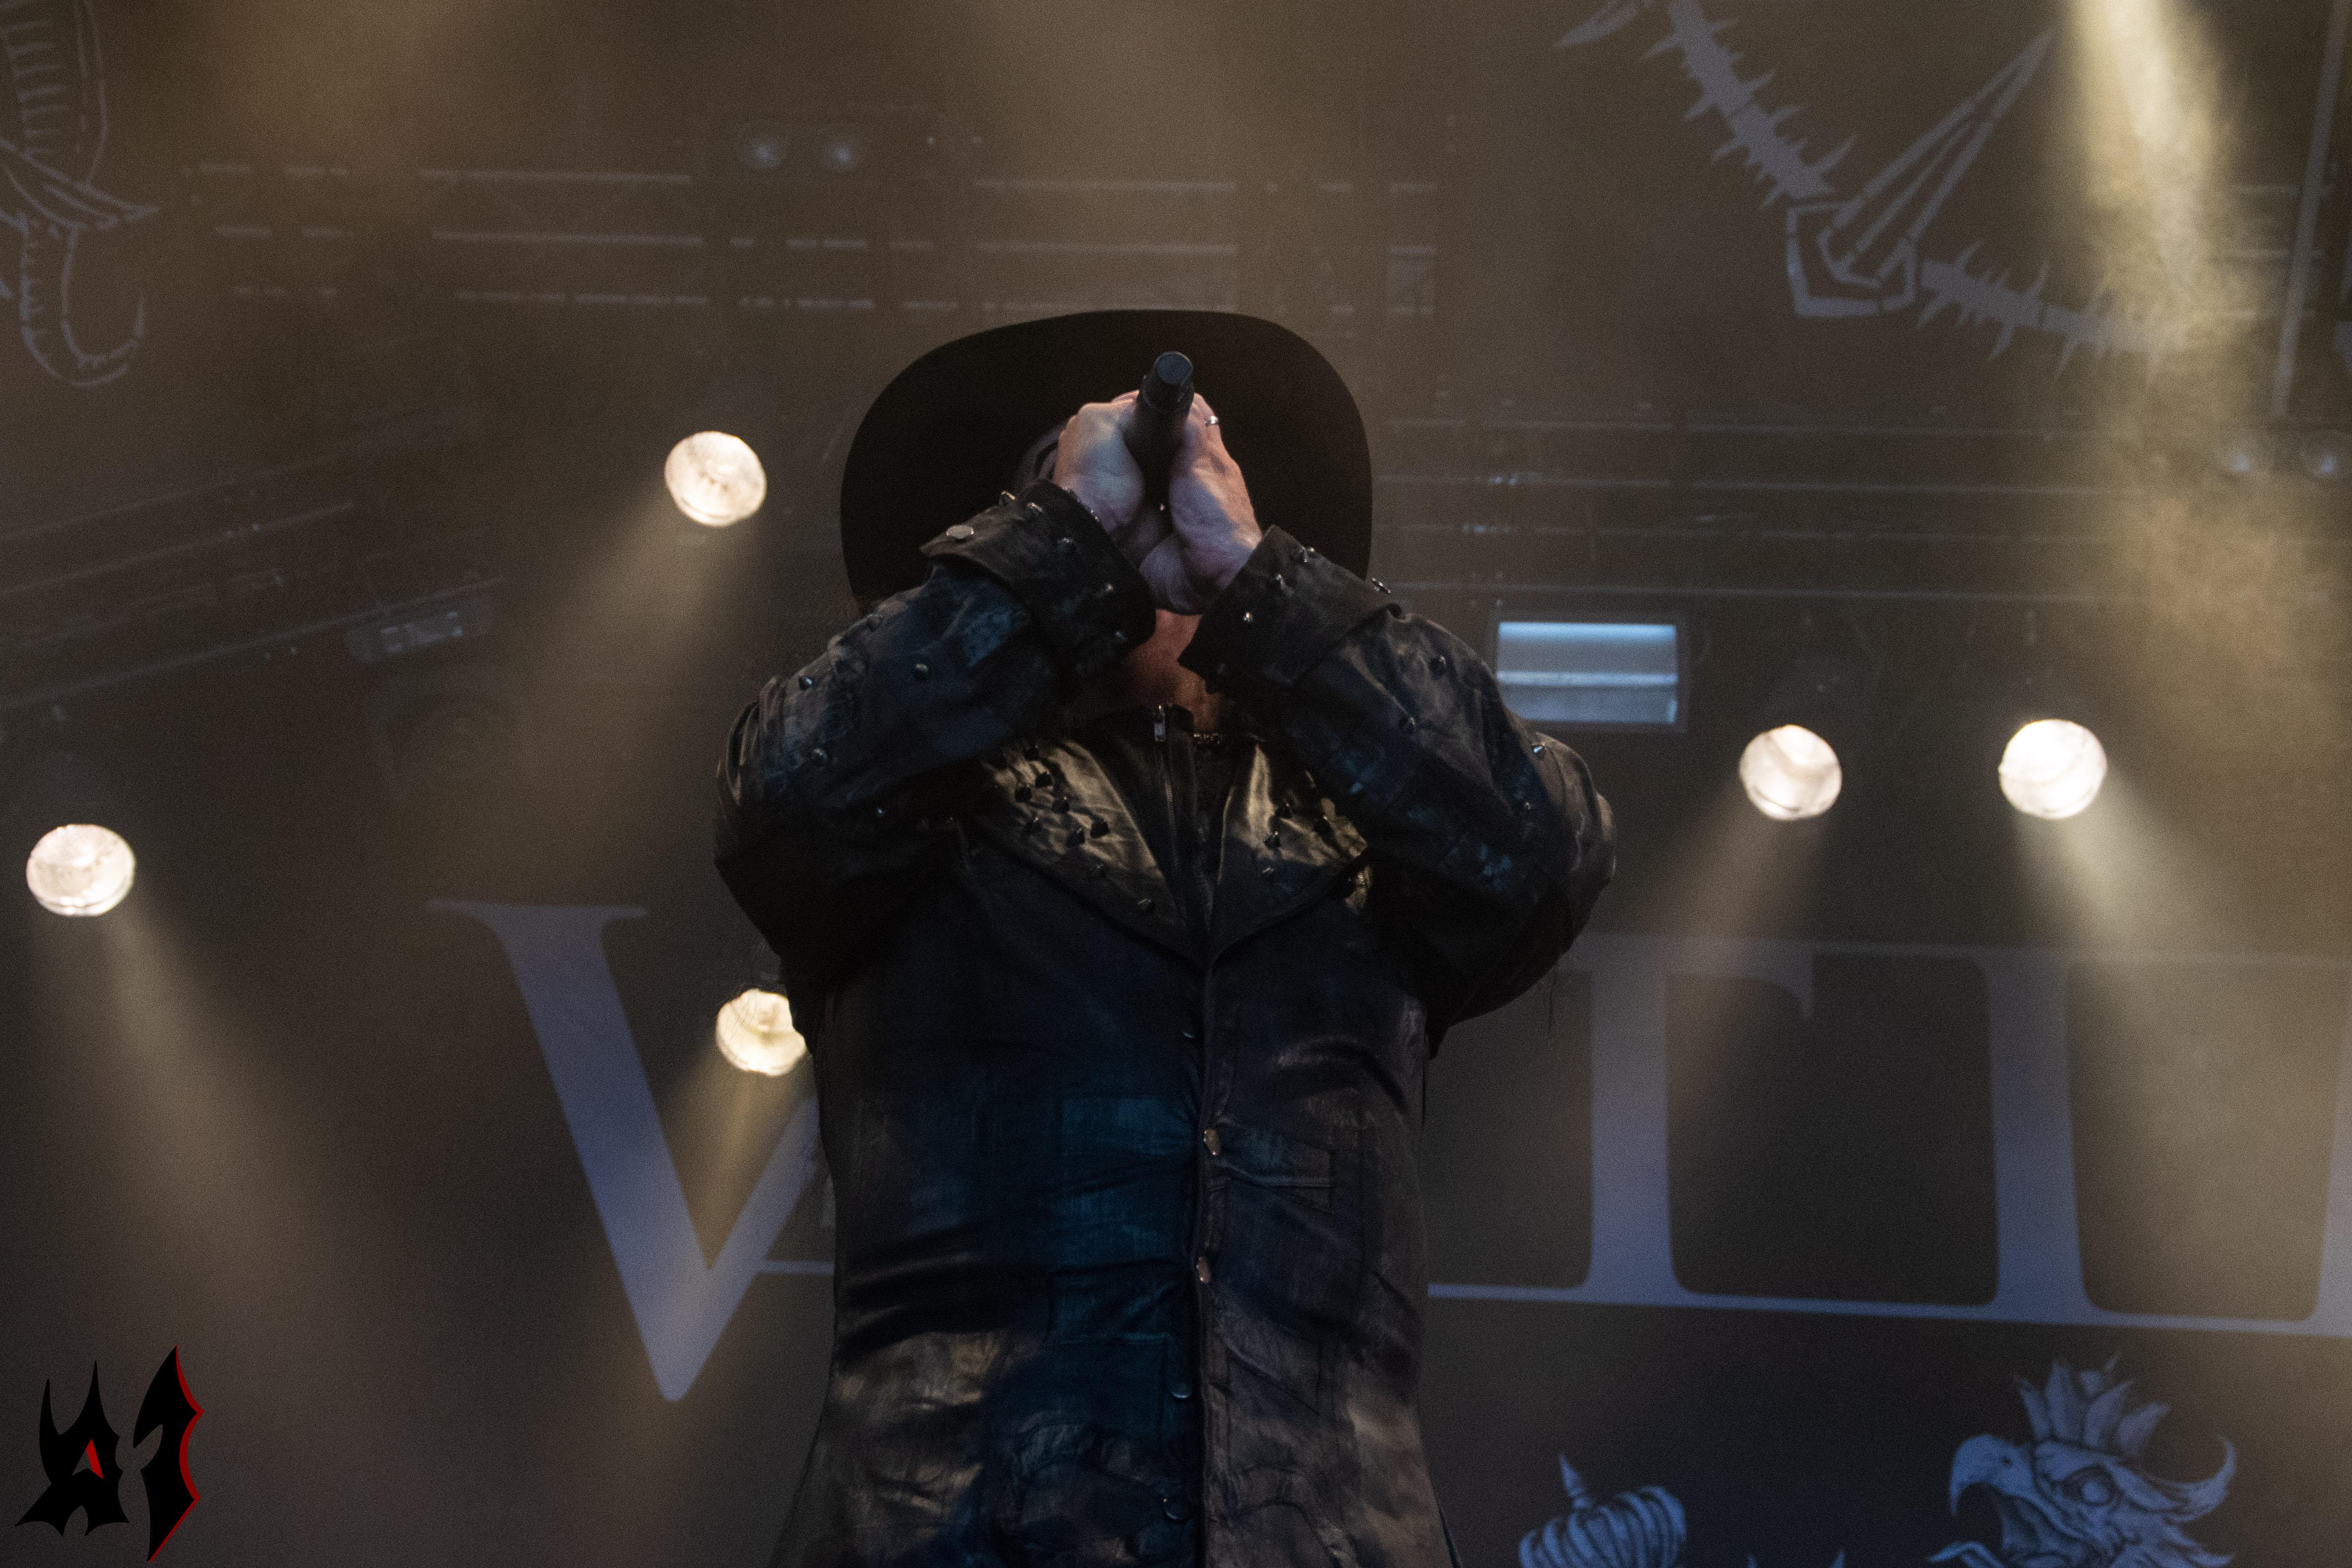 Hellfest - Vltimas - 9